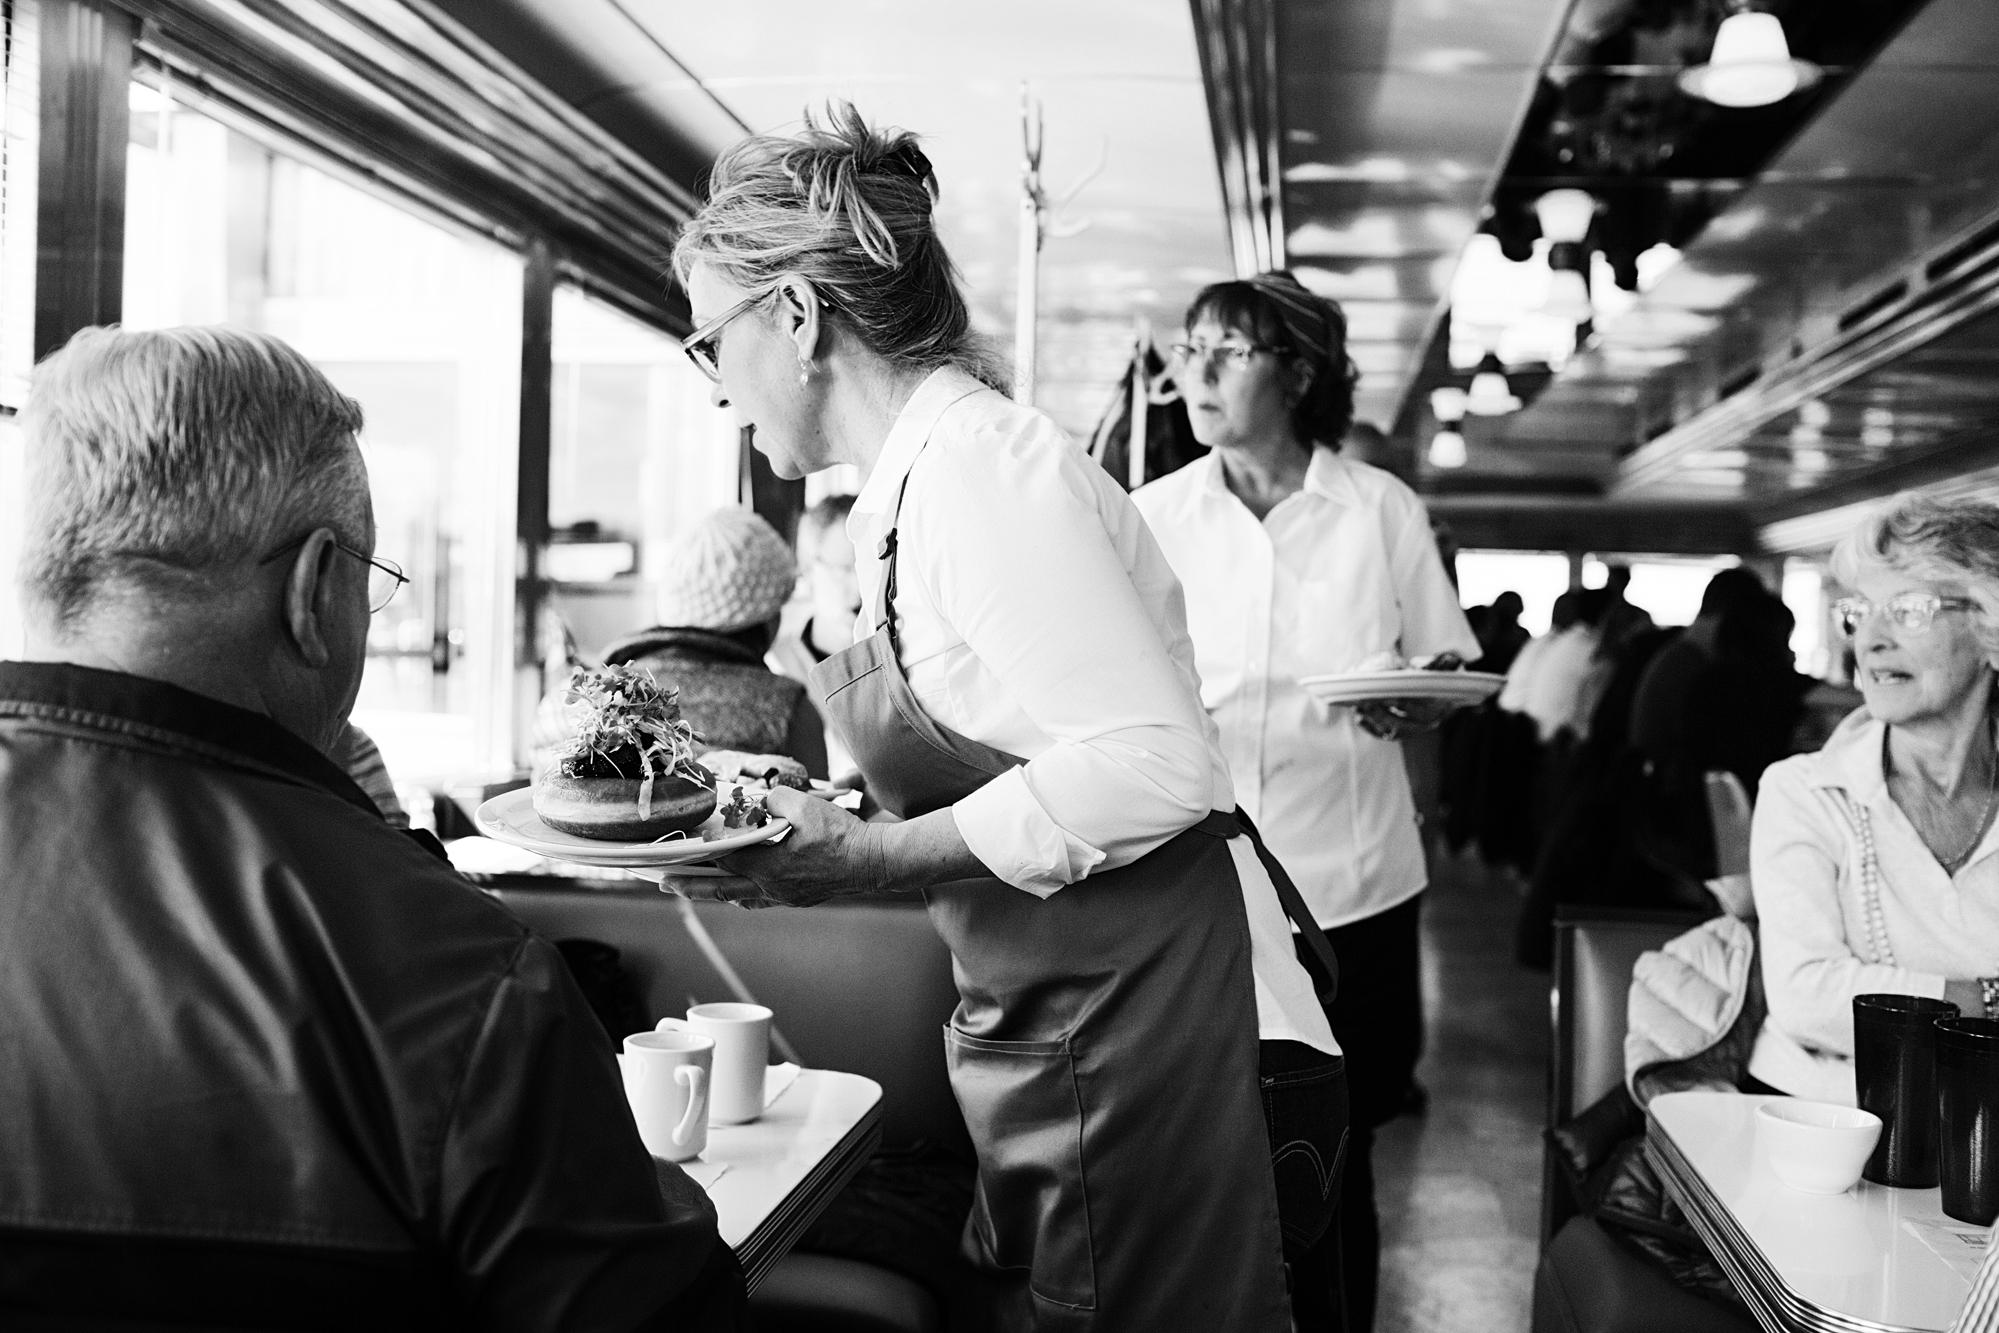 Interior shot of Hi-Lo Diner | The Restaurant Project